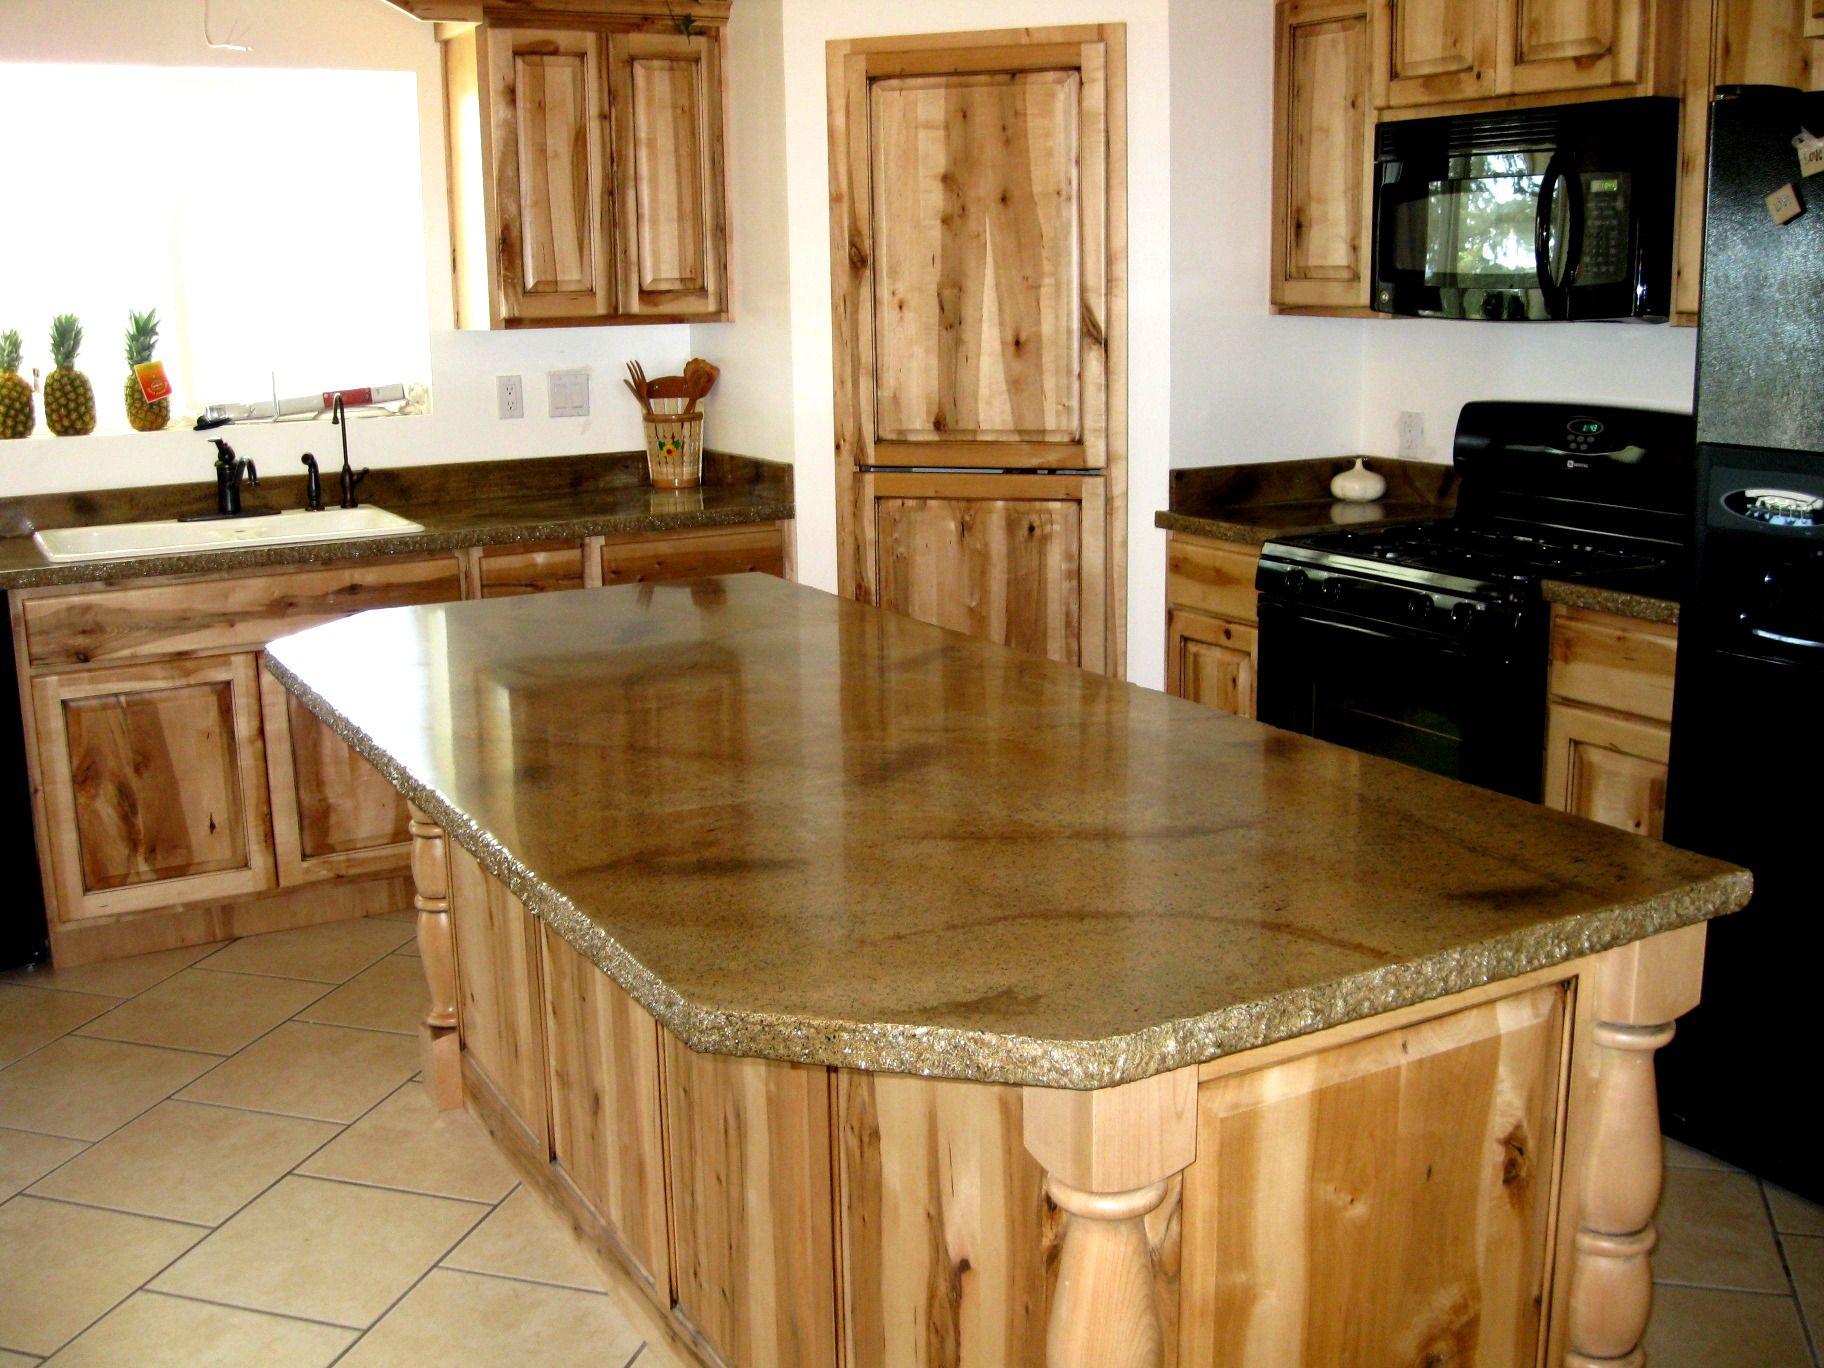 Best wood for butcher block kitchen sleek brown granite tile